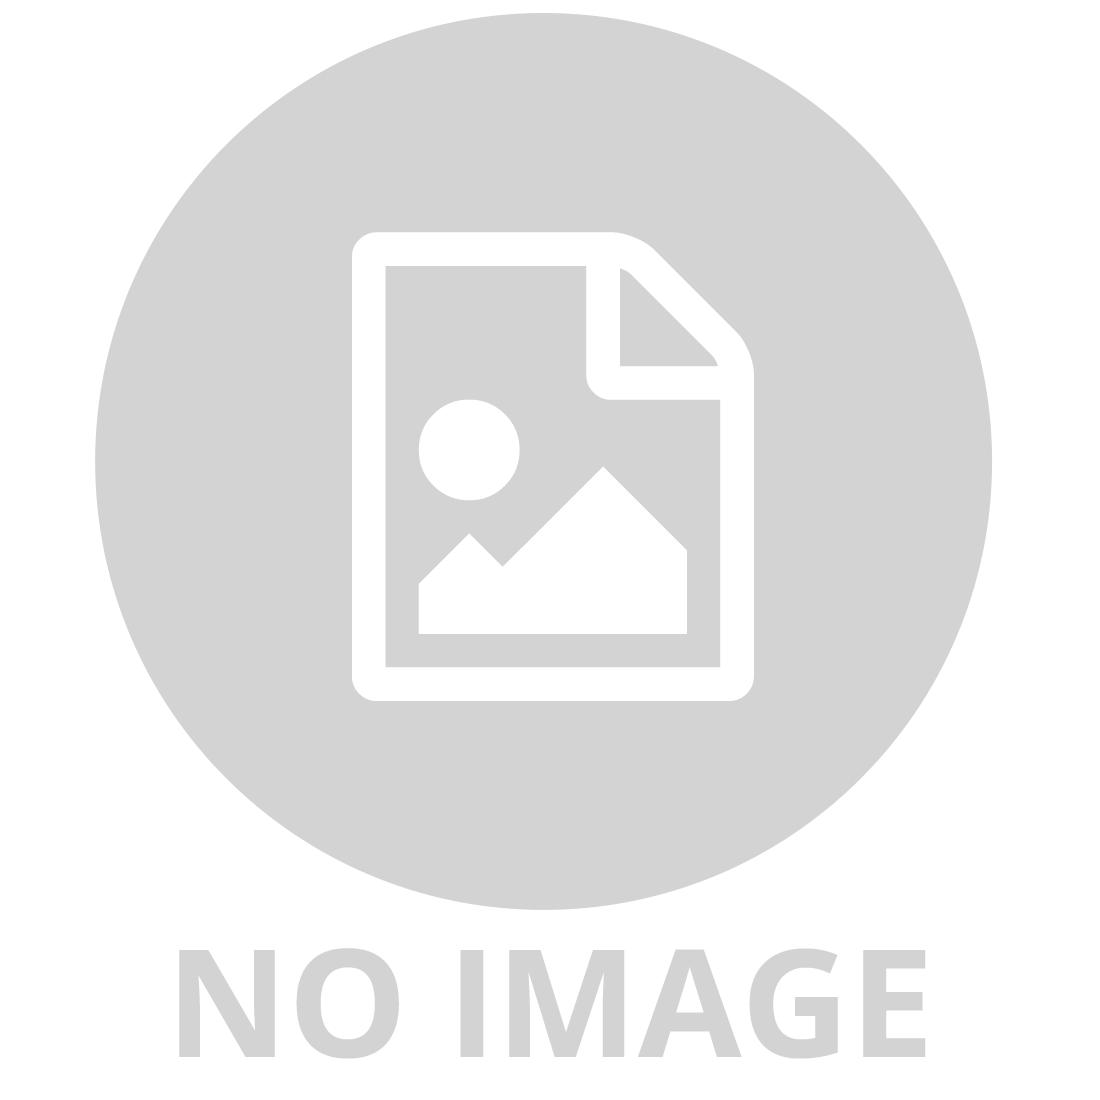 WAHU- POOL BASKETBALL